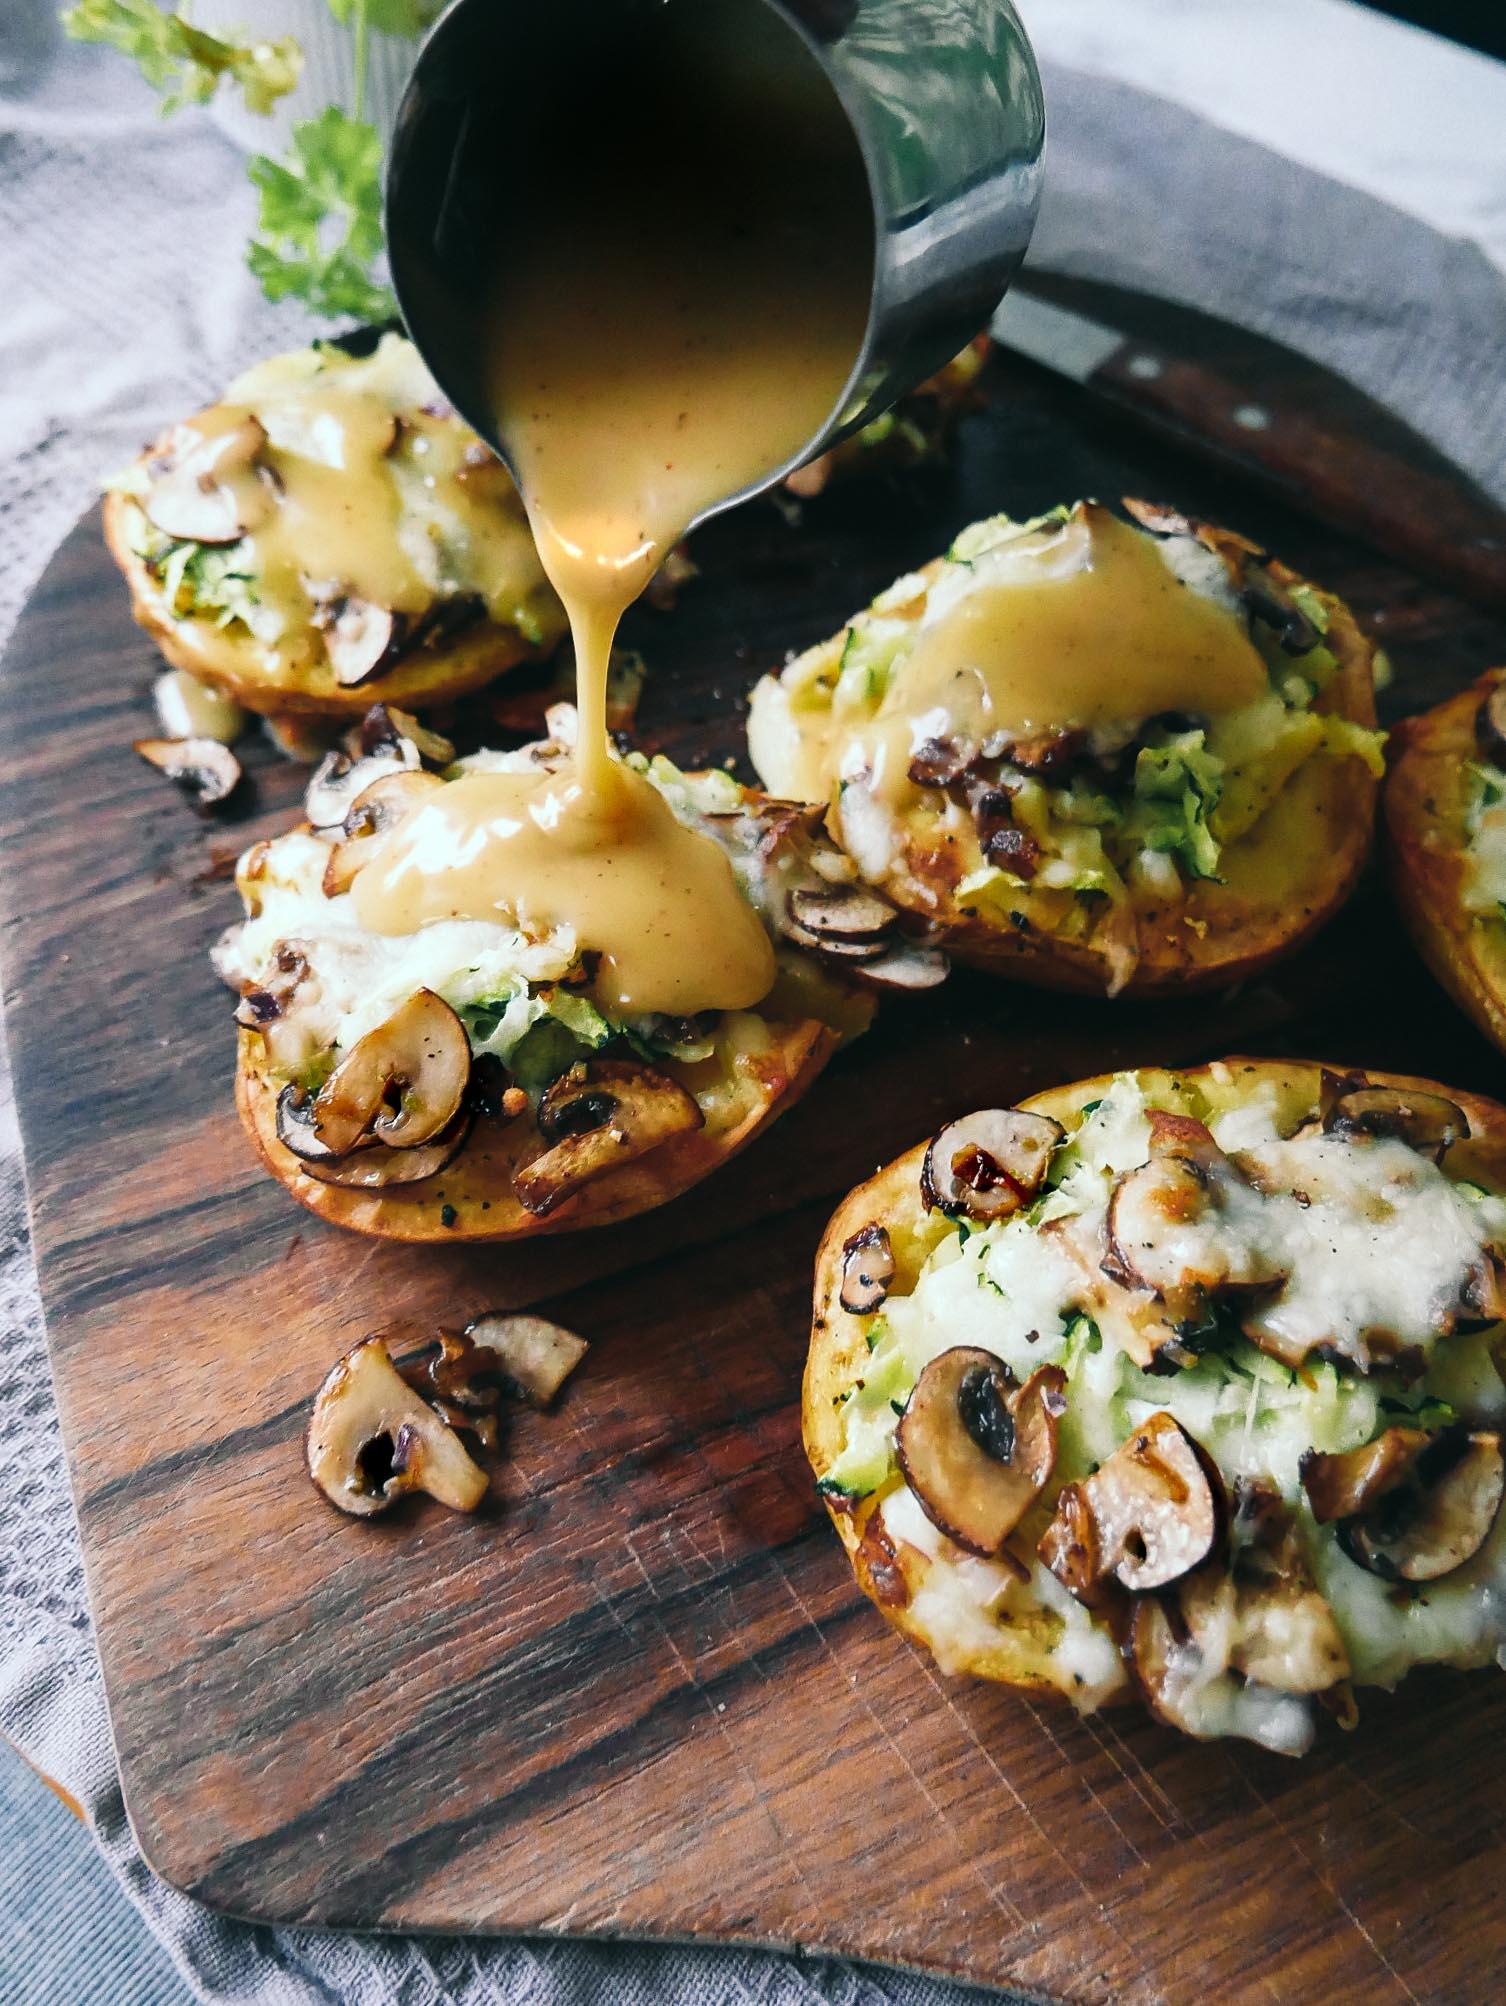 stuffed potatoes with zucchini and cheese